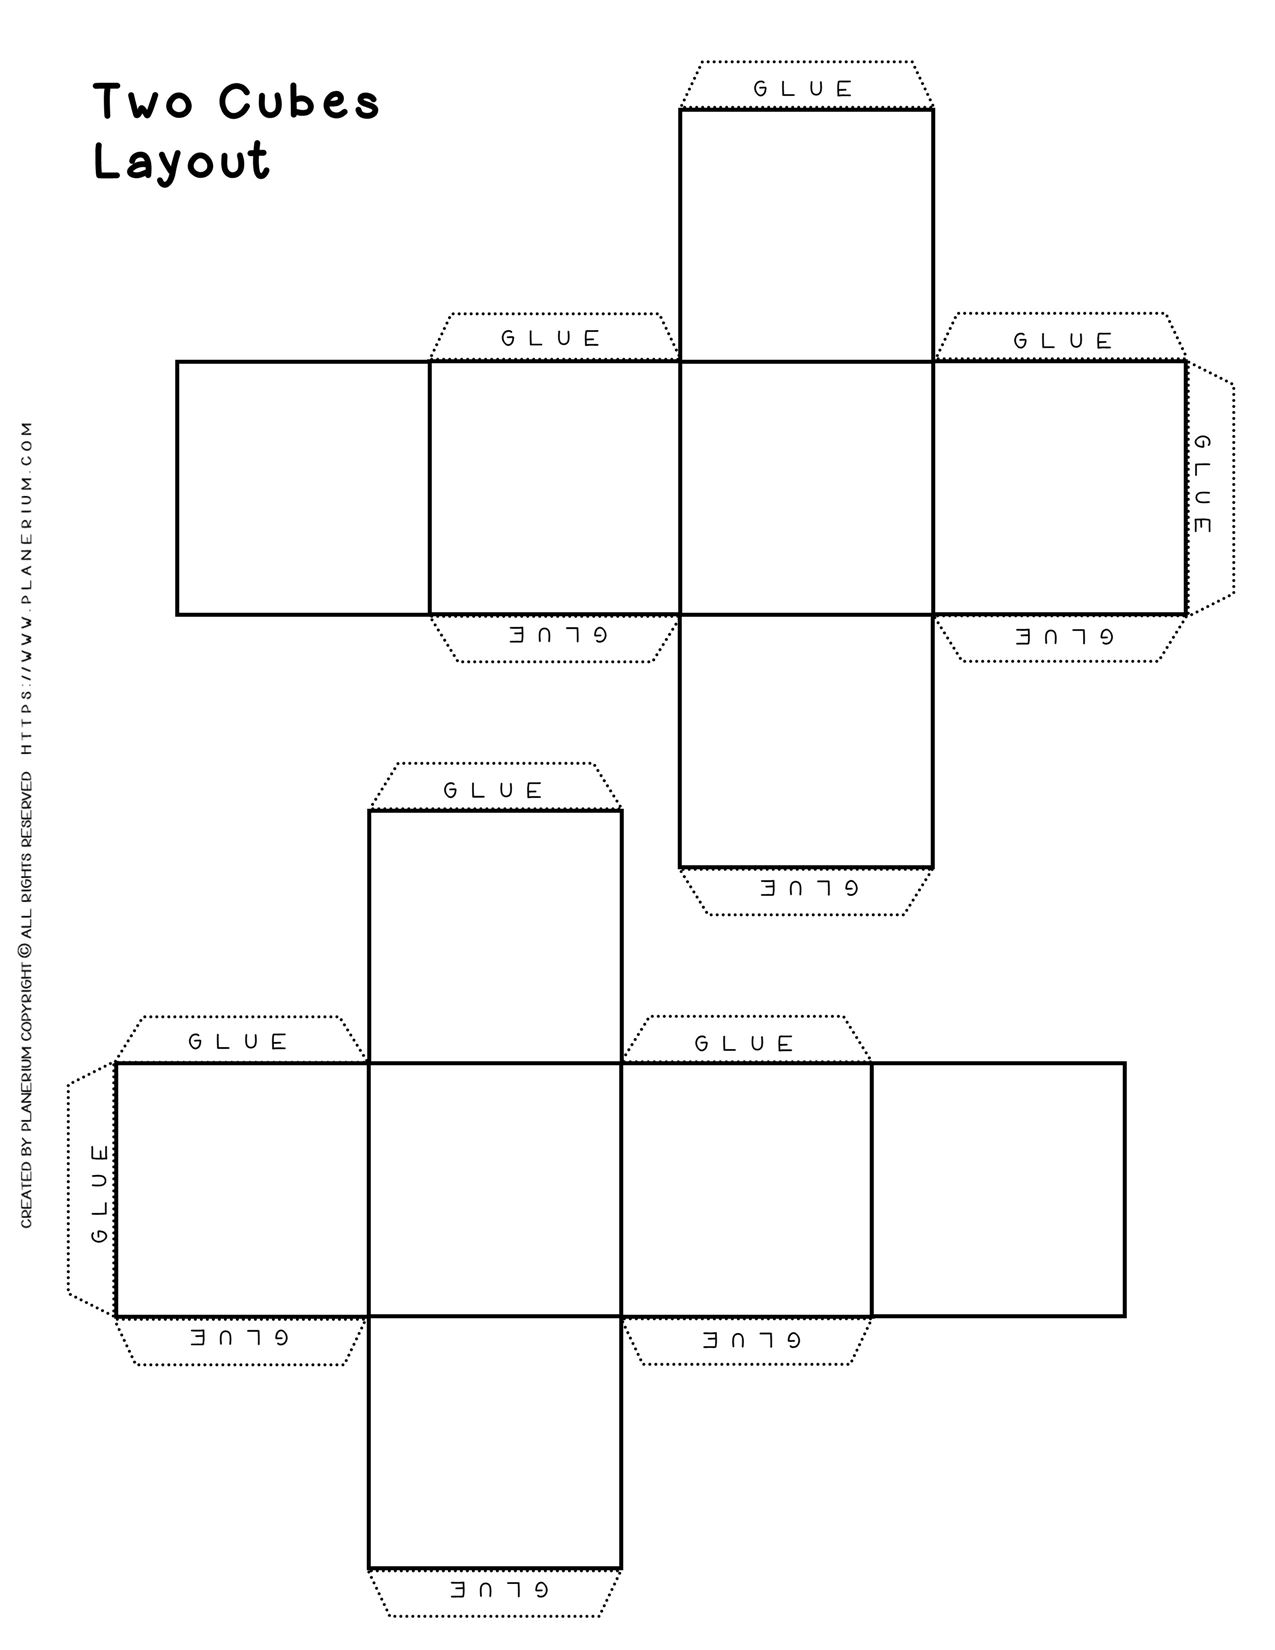 Cube Layout - Two Cubes | Planerium